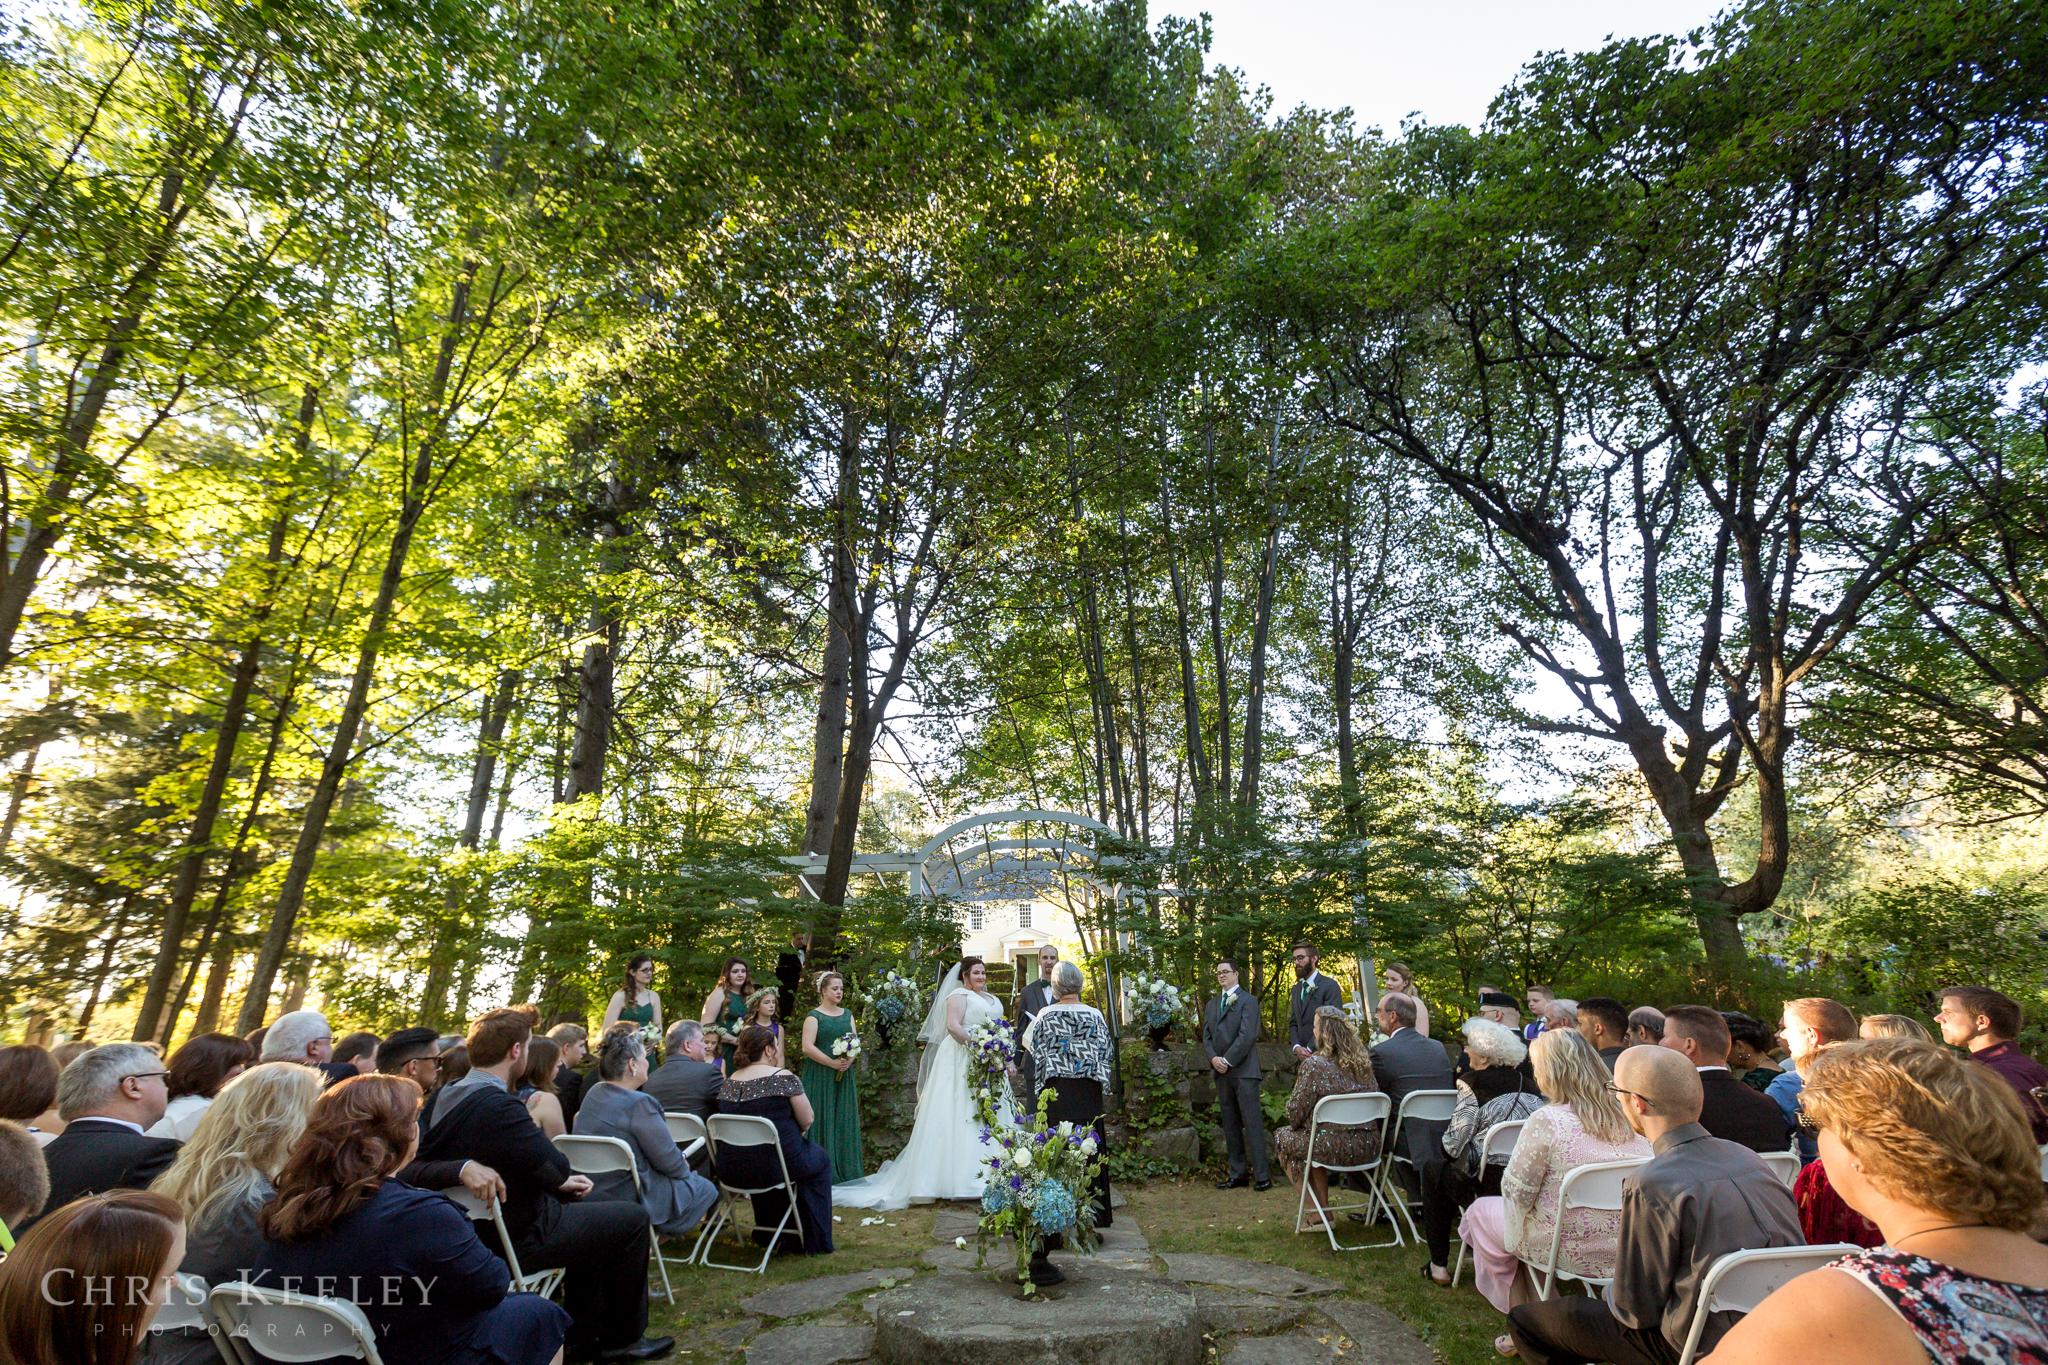 new-hampshire-wedding-photographer-three-chimneys-inn-chris-keeley-photography-13.jpg